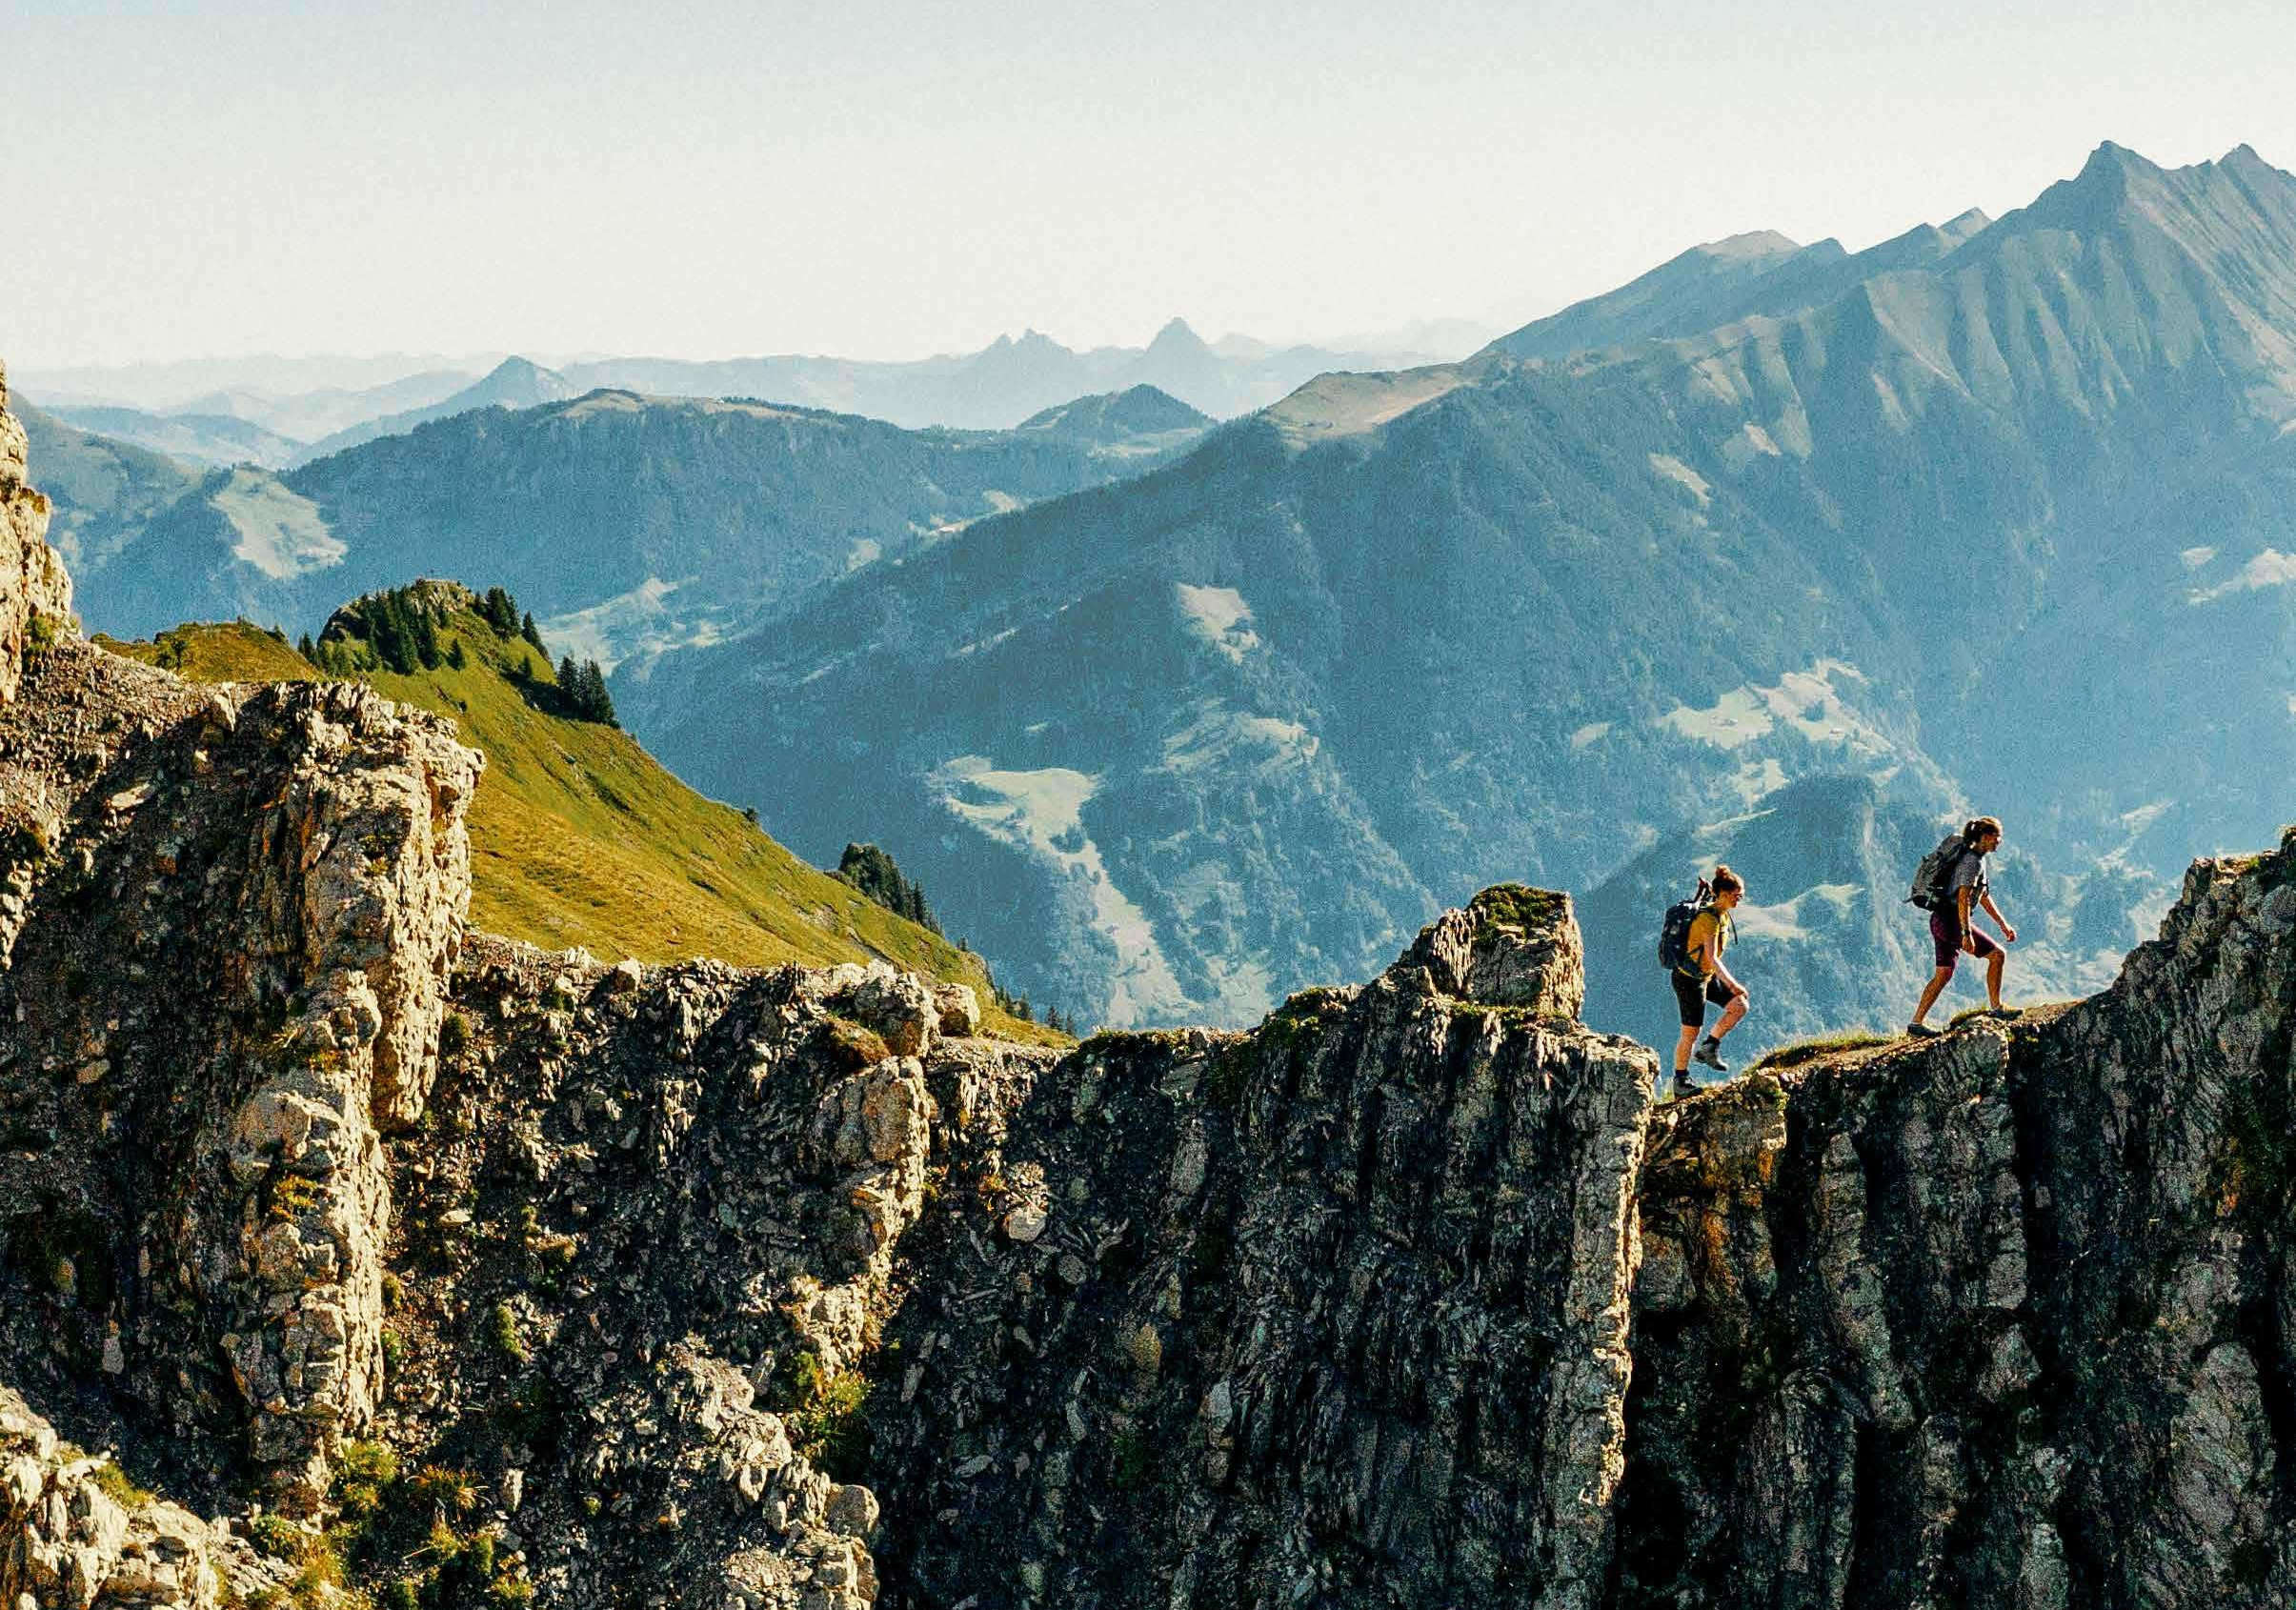 Trekking dedicato a Guglielmo Tell